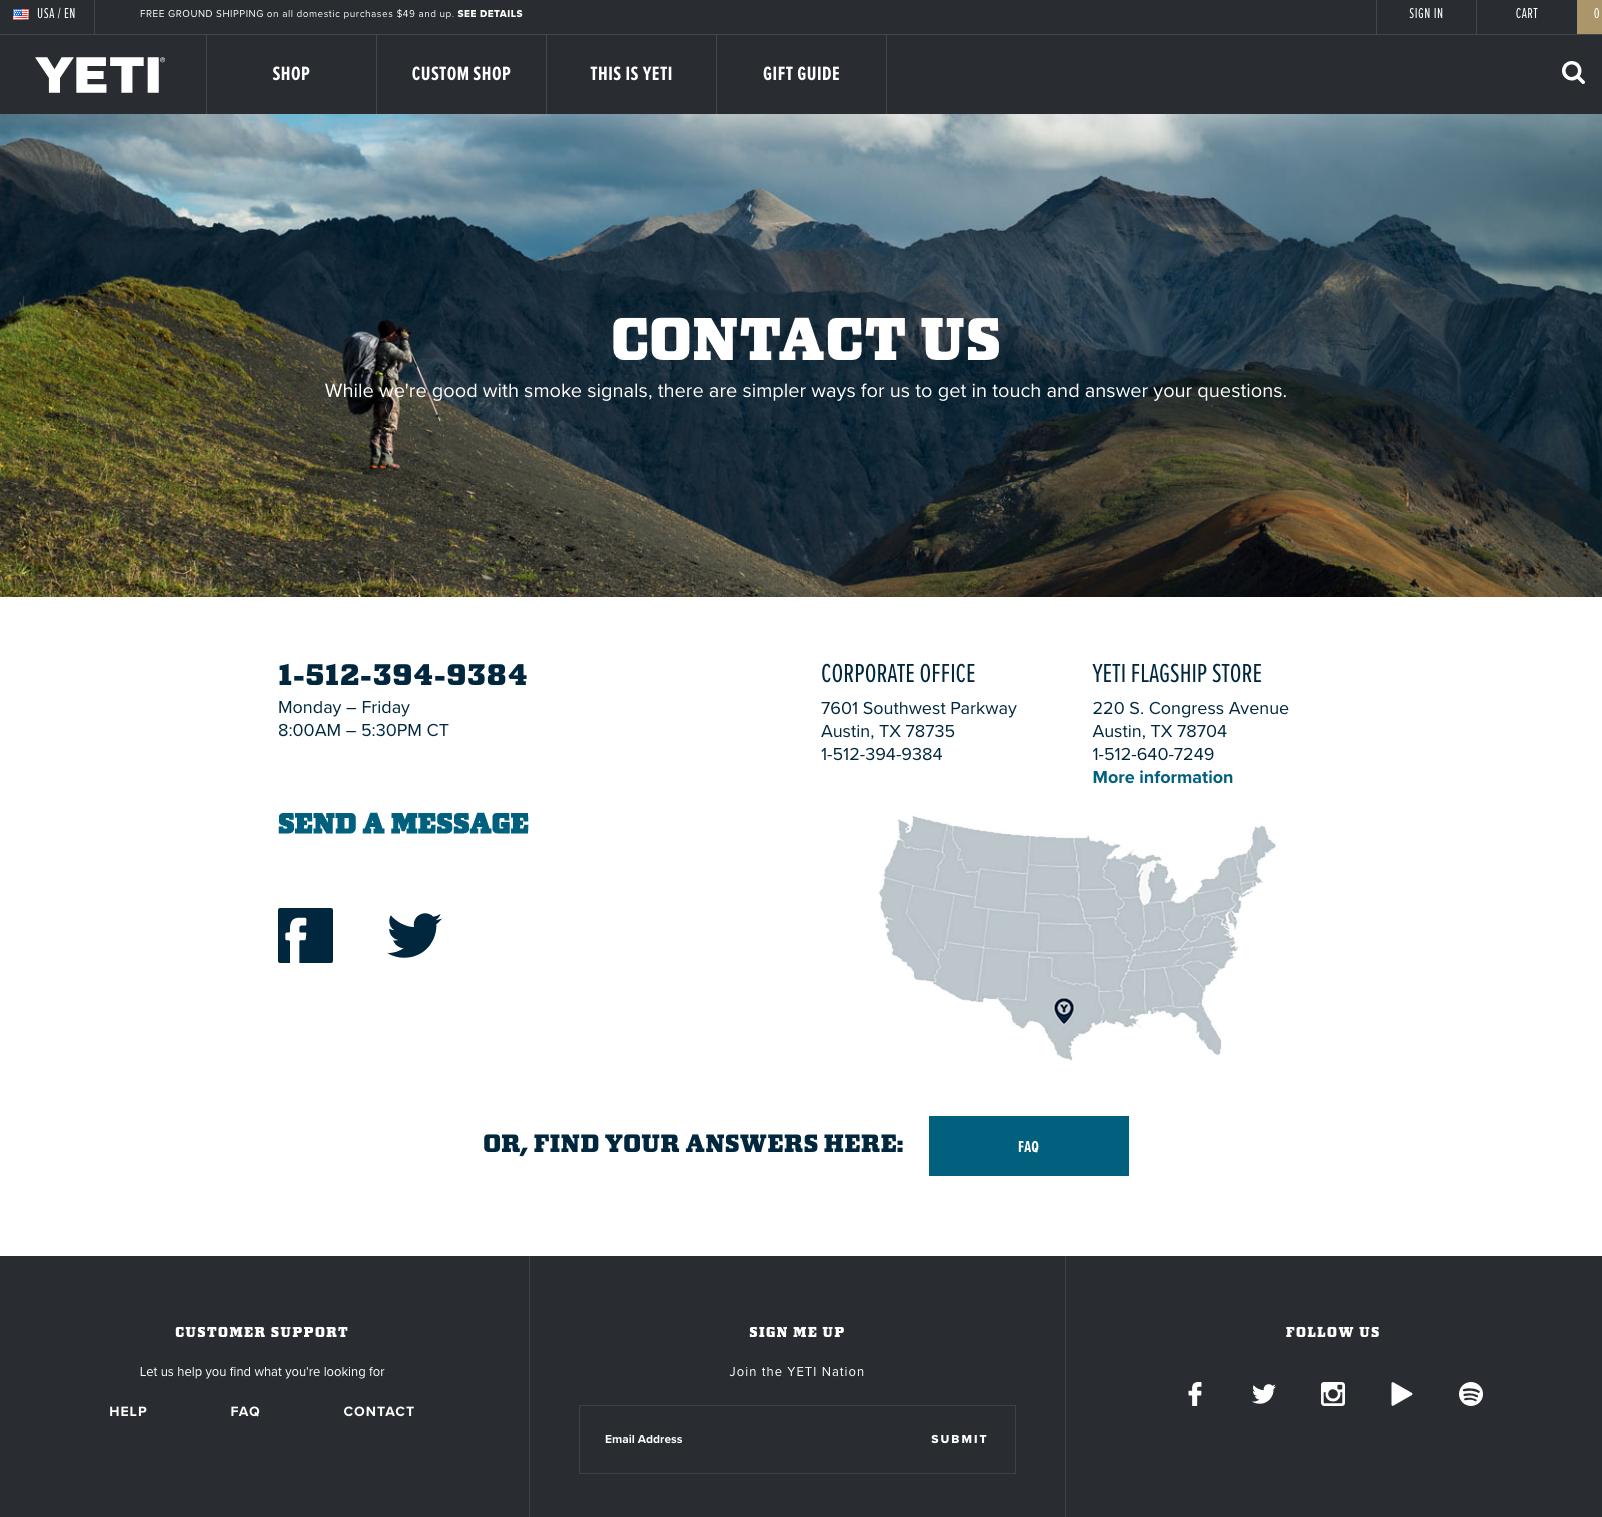 yeti-contact-us-page